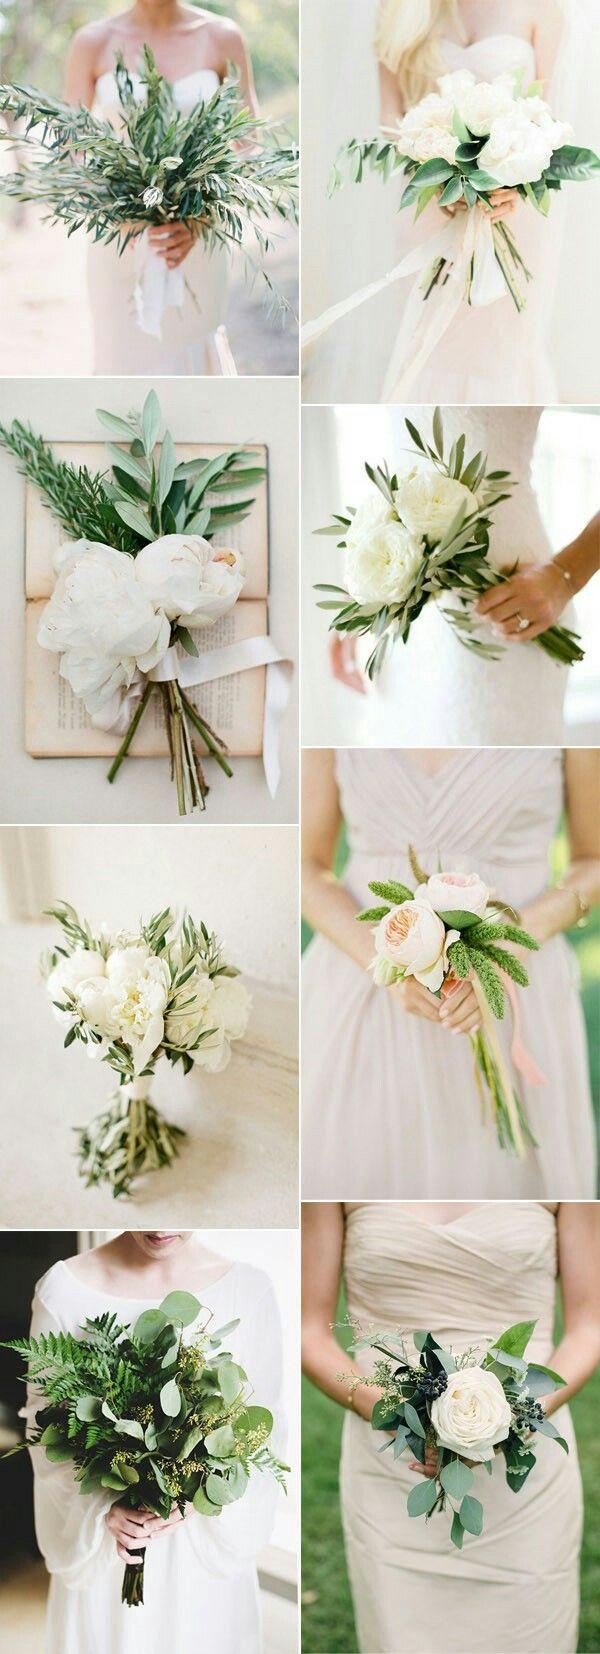 best weddings images on Pinterest  Wedding frocks Homecoming